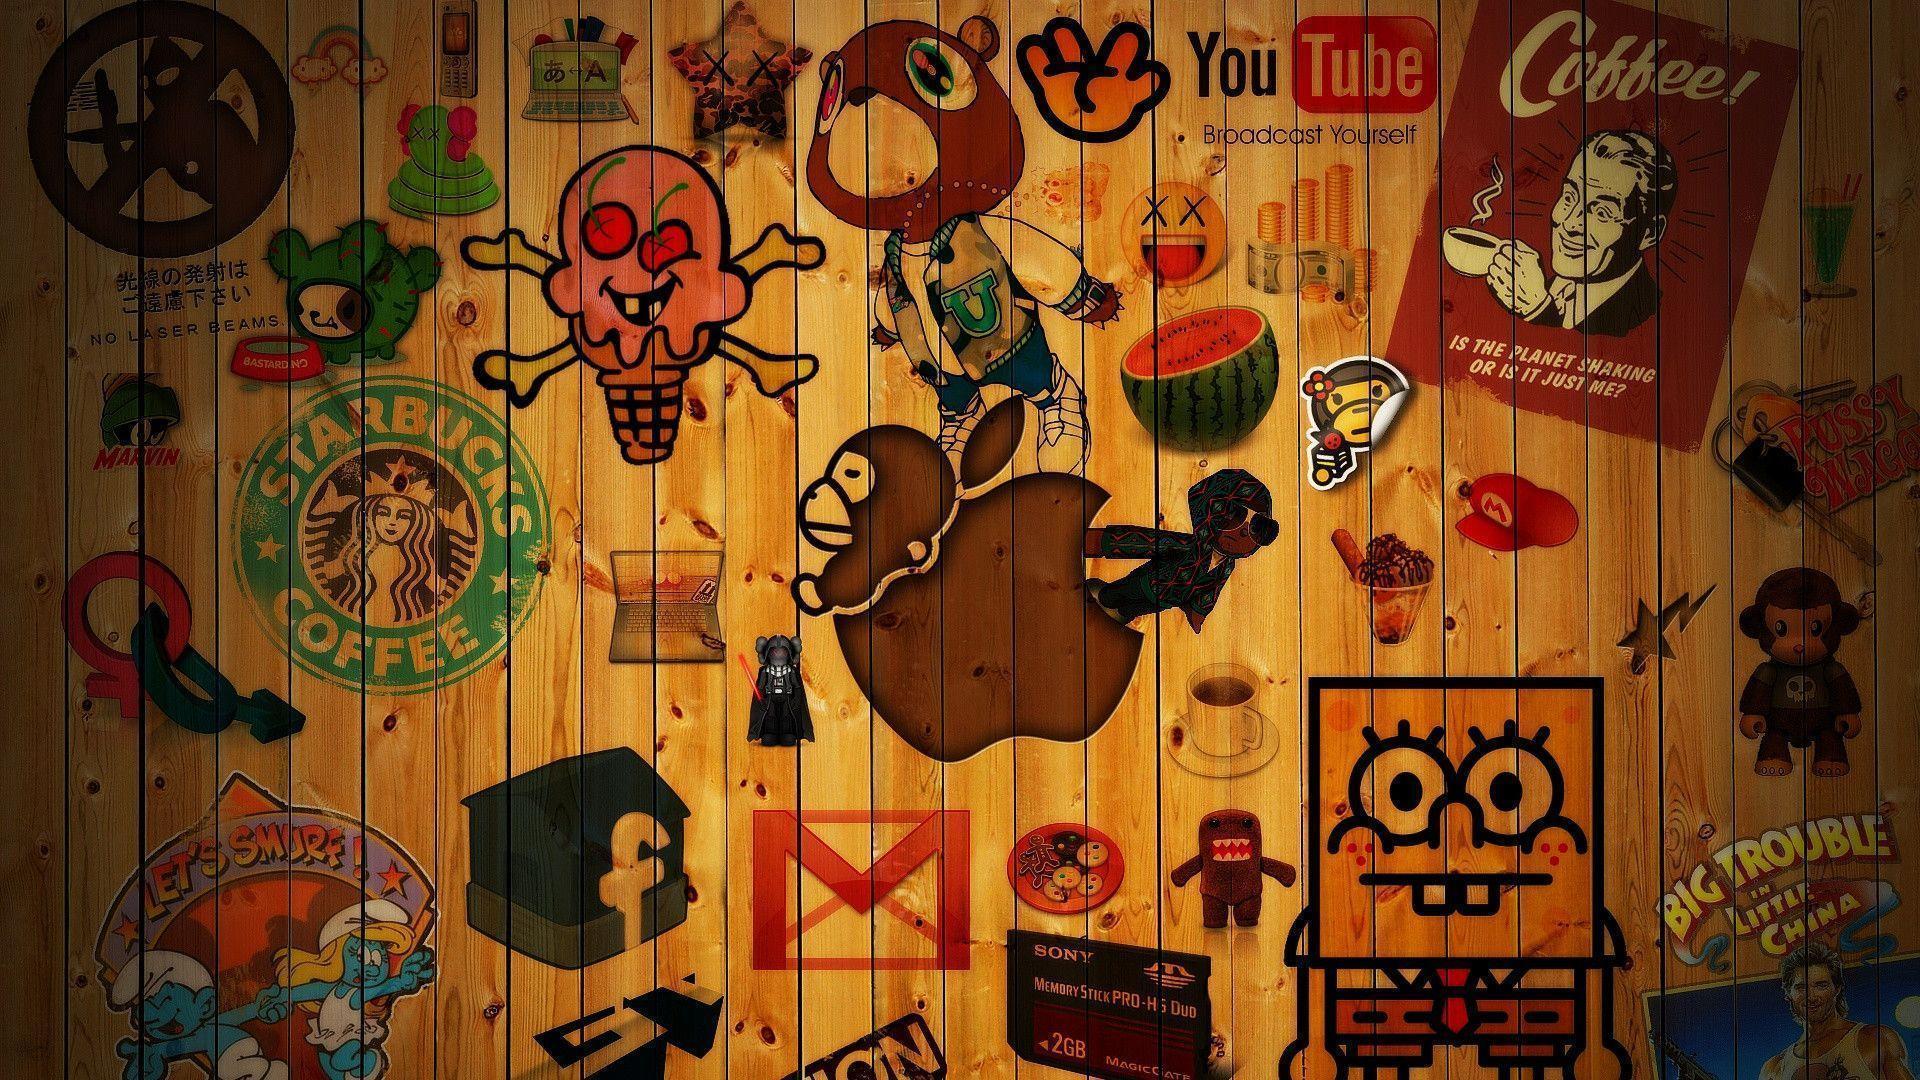 hd cool wallpapers - wallpaper cave